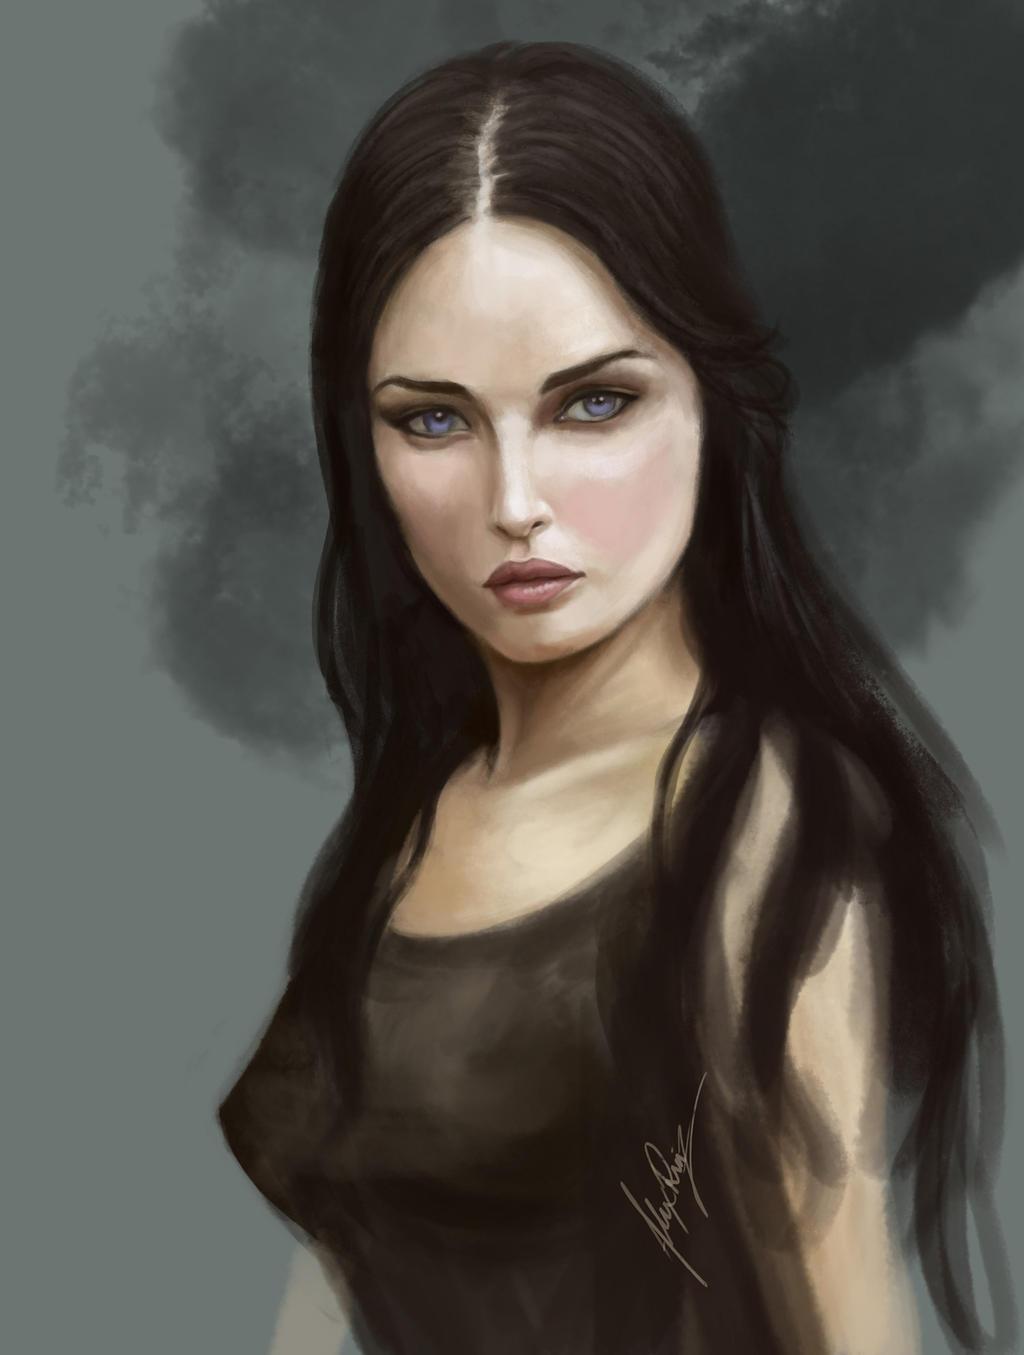 Female Portrait Study